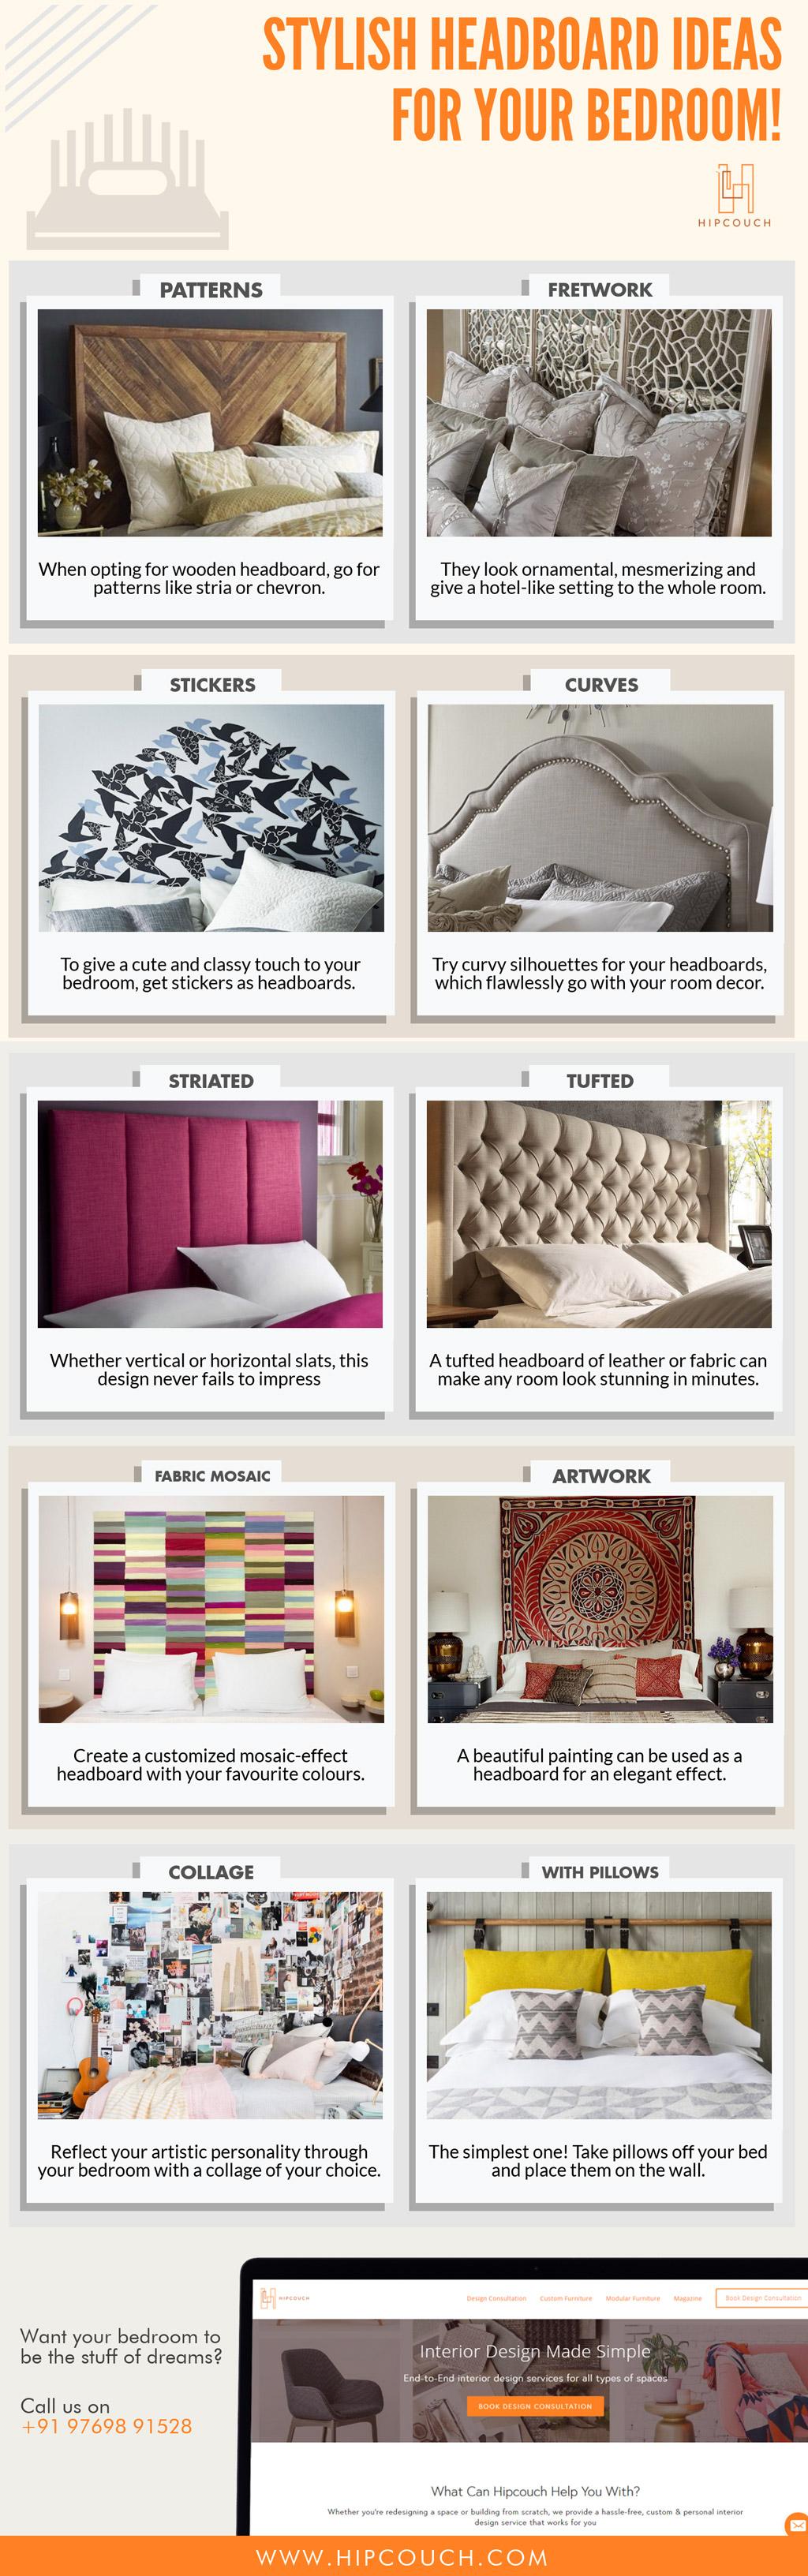 Headboard-Ideas-for-your-bedroom.jpg